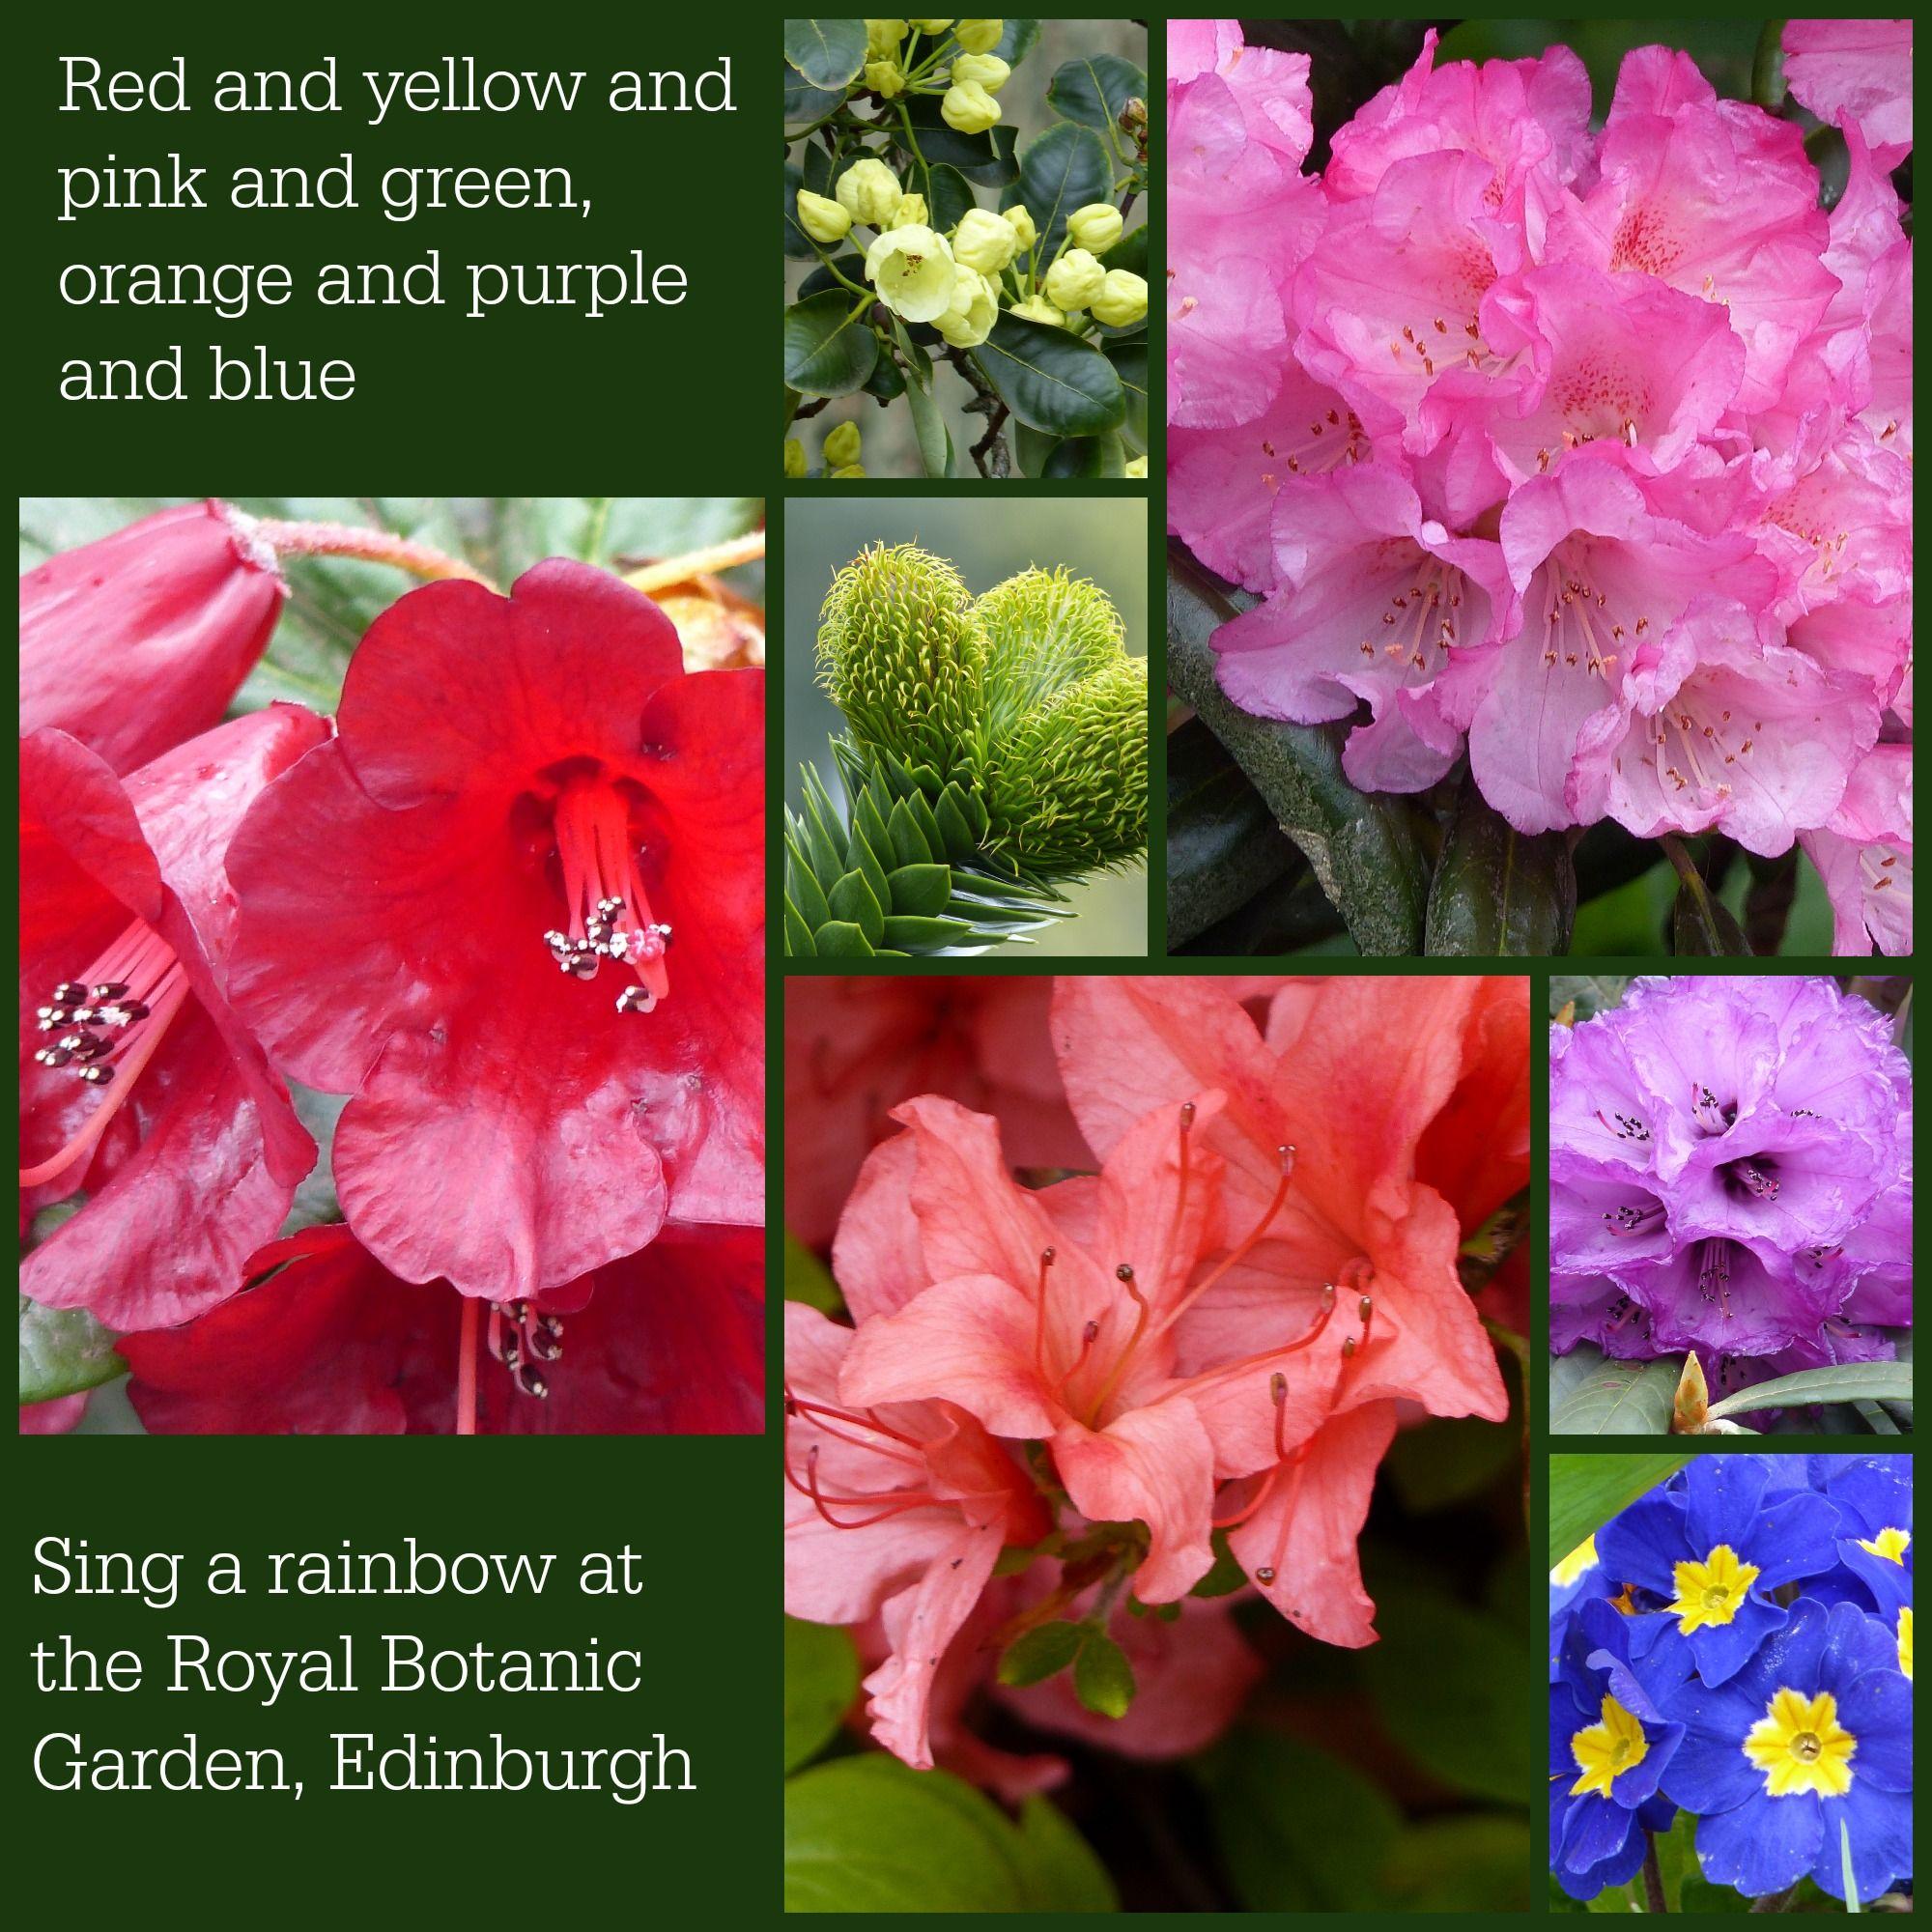 A rainbow of flower colours at the Royal Botanic Garden, Edinburgh ...